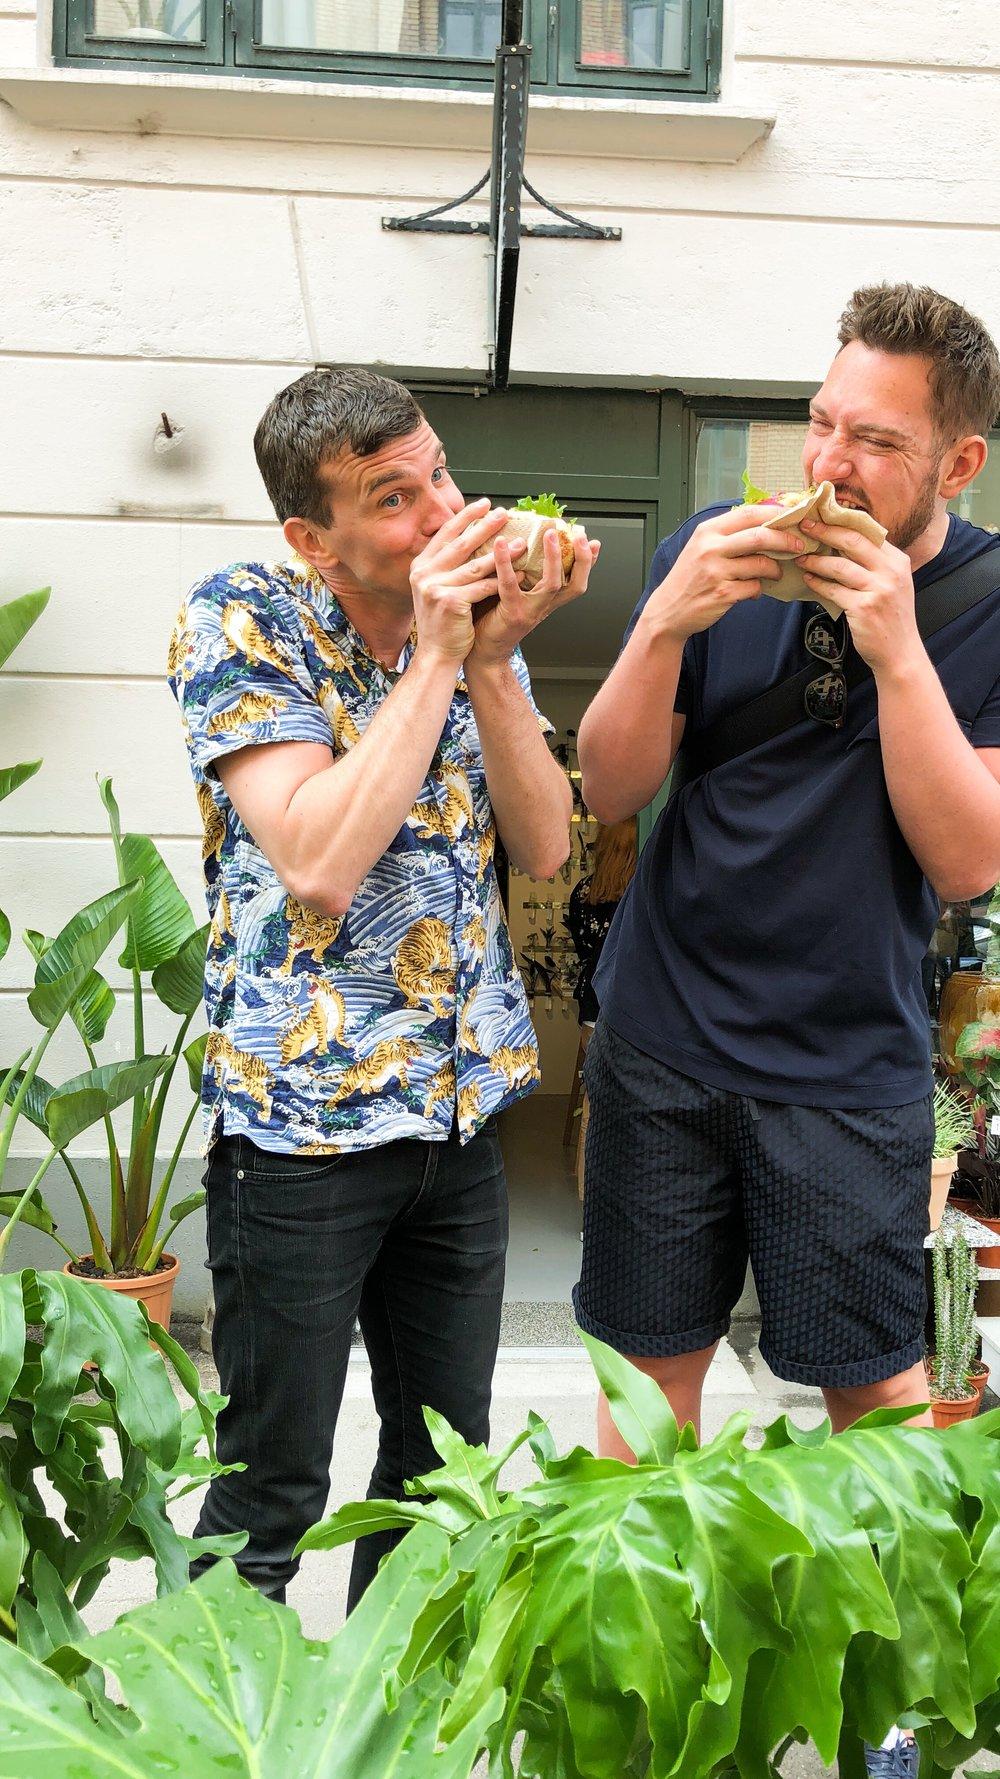 ....og Plantepølsen servede de lækreste Plante pølse hotdogs. -